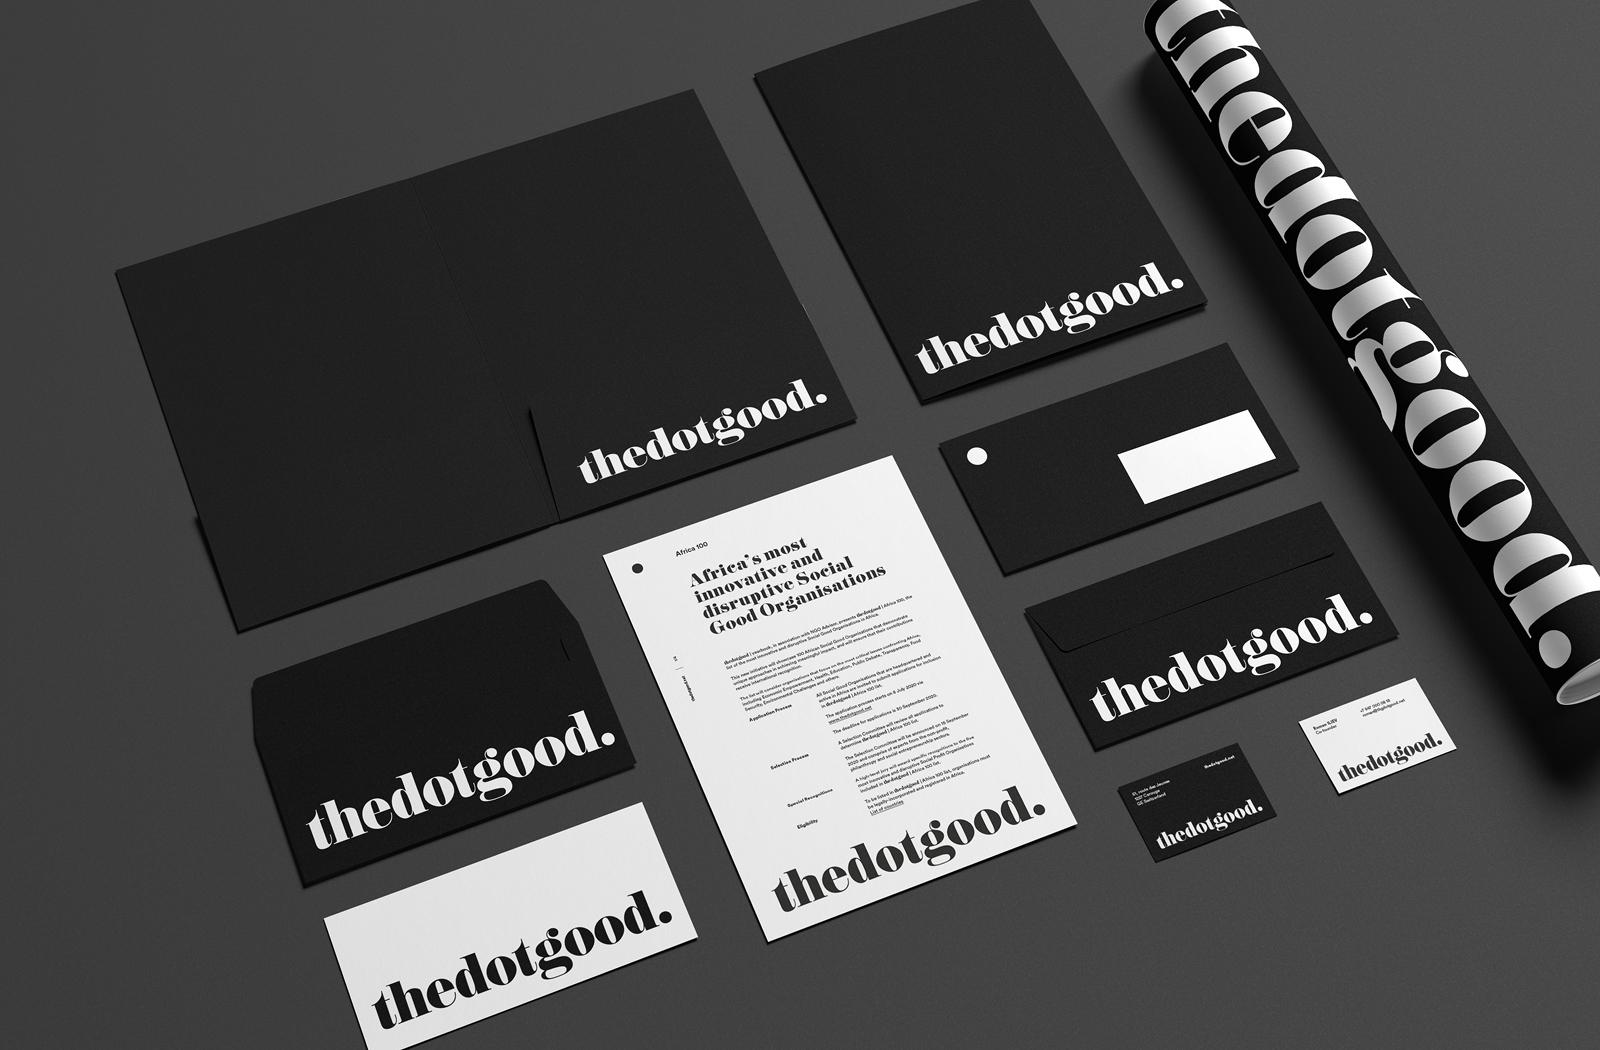 josselin tourette – thedotgood – identiy – branding – 1